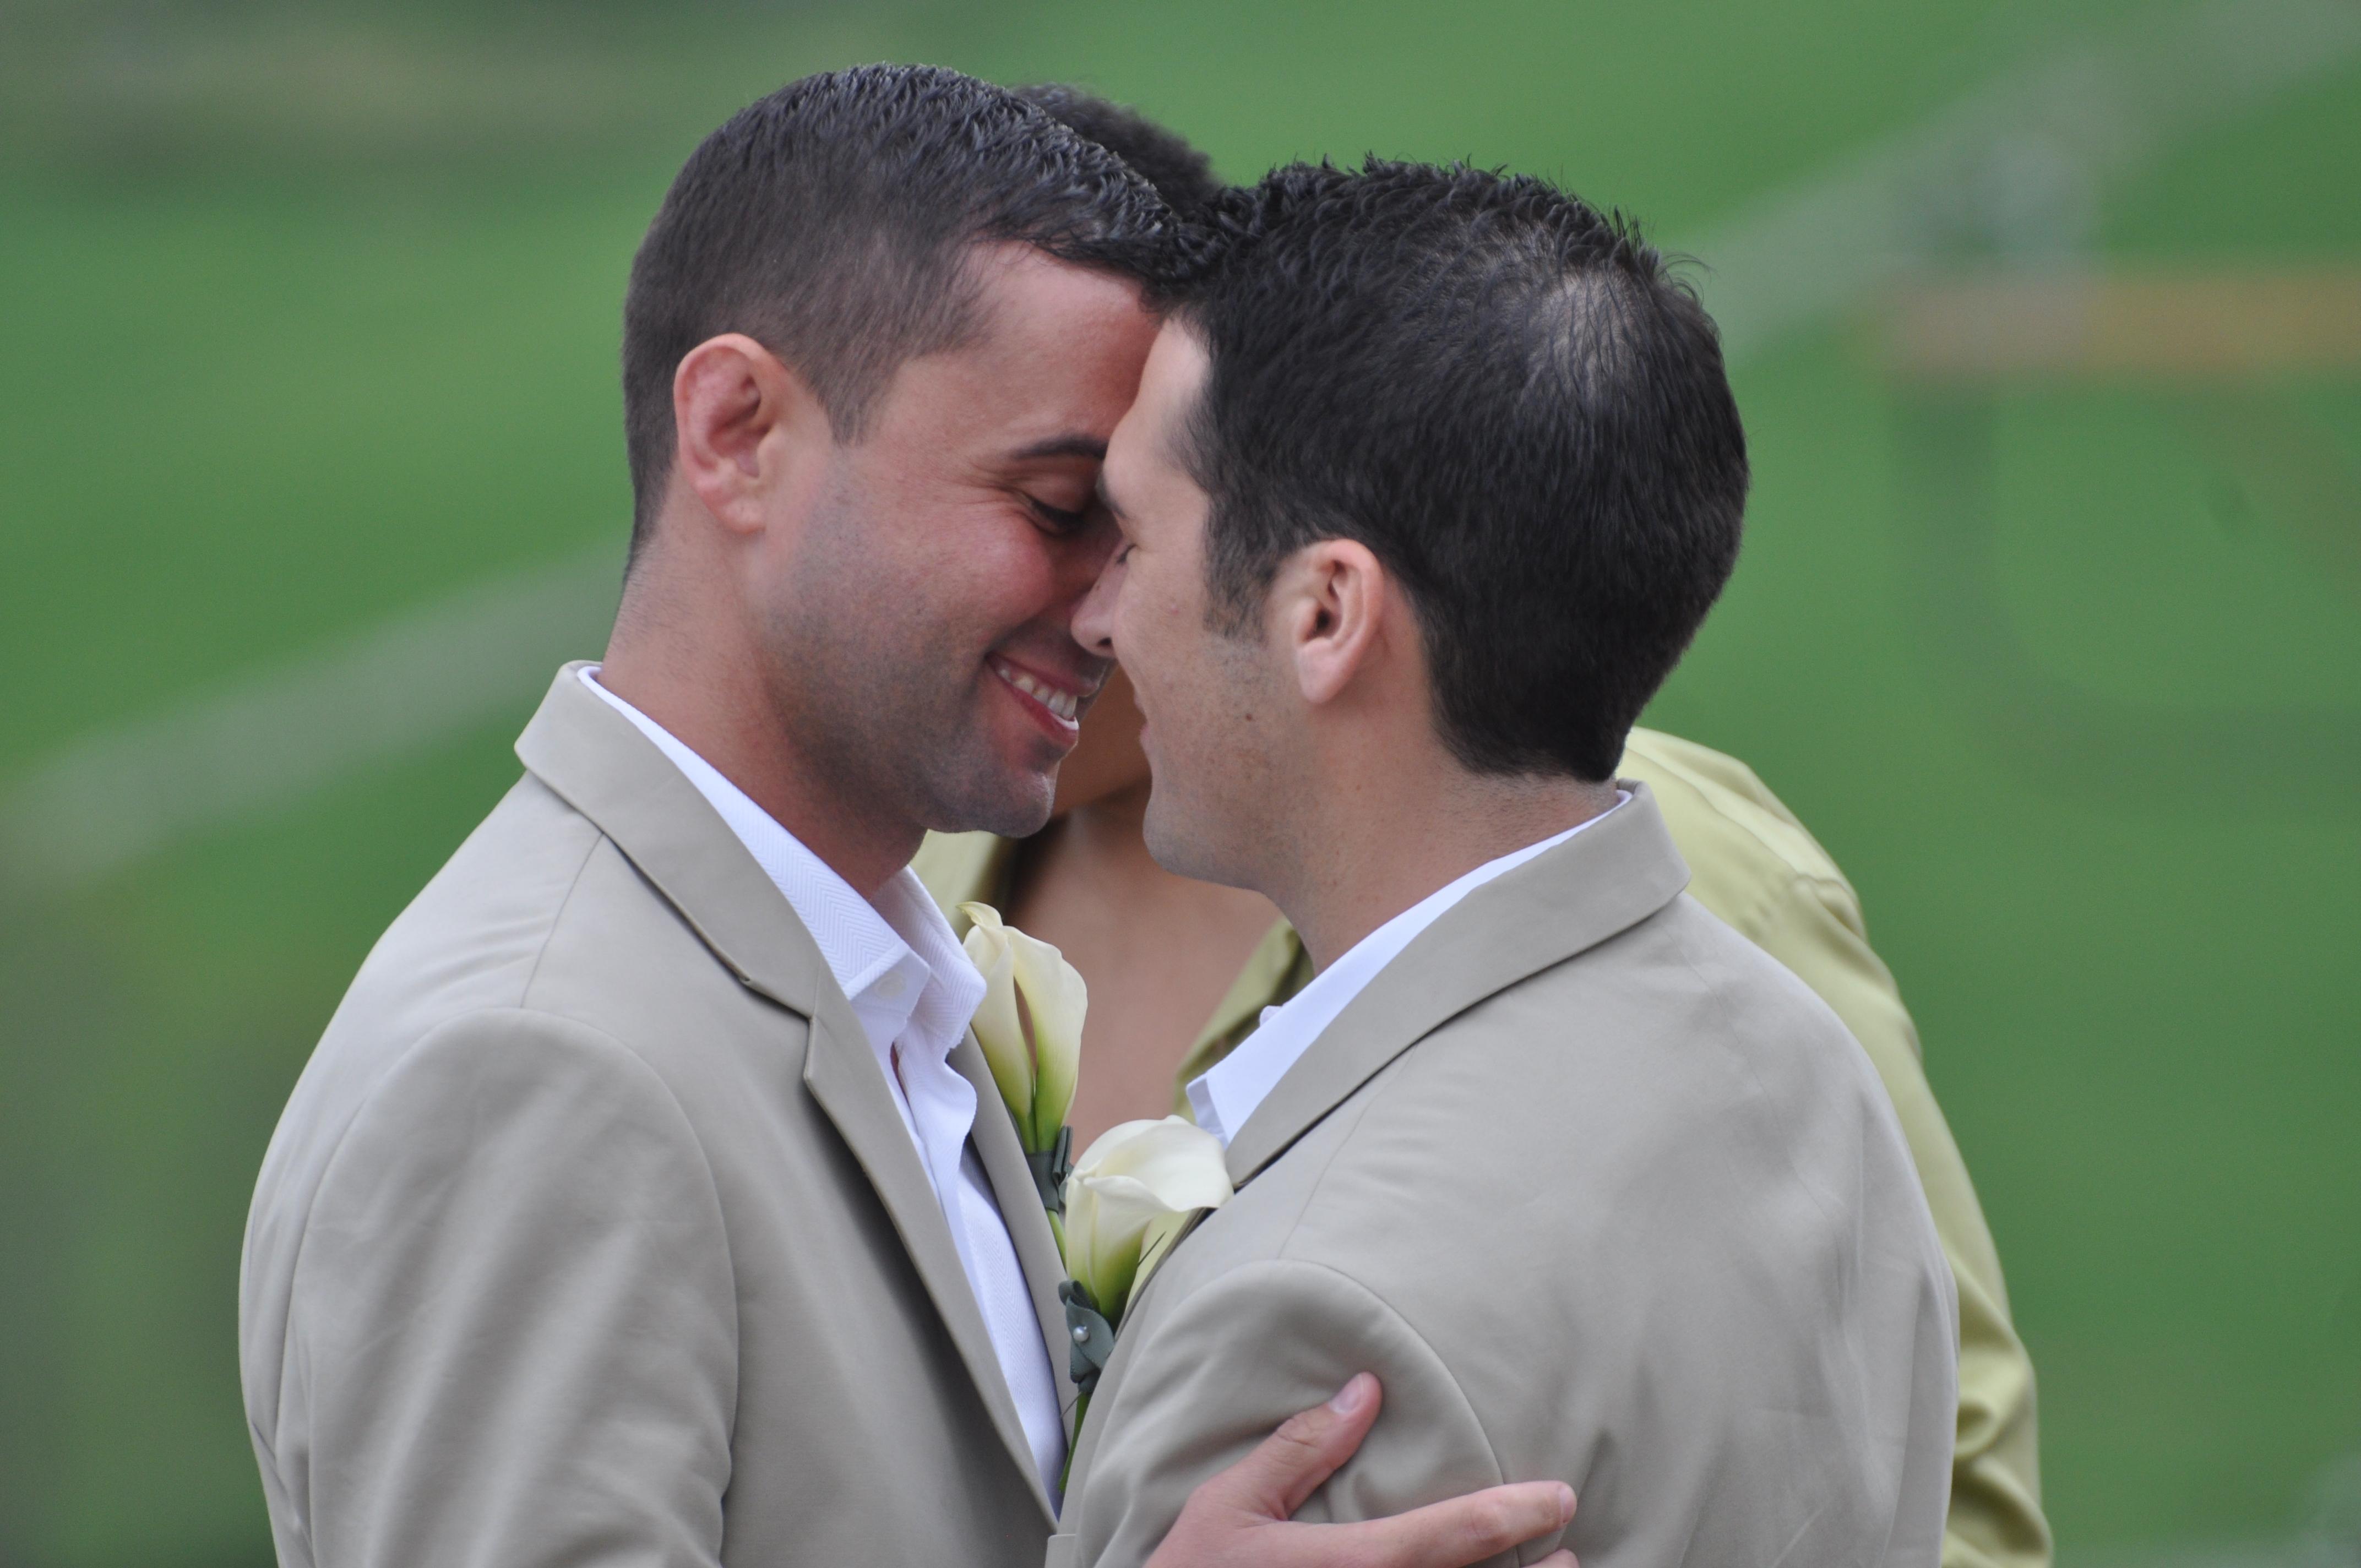 from Christopher jonathan taylor thomas gay rumors